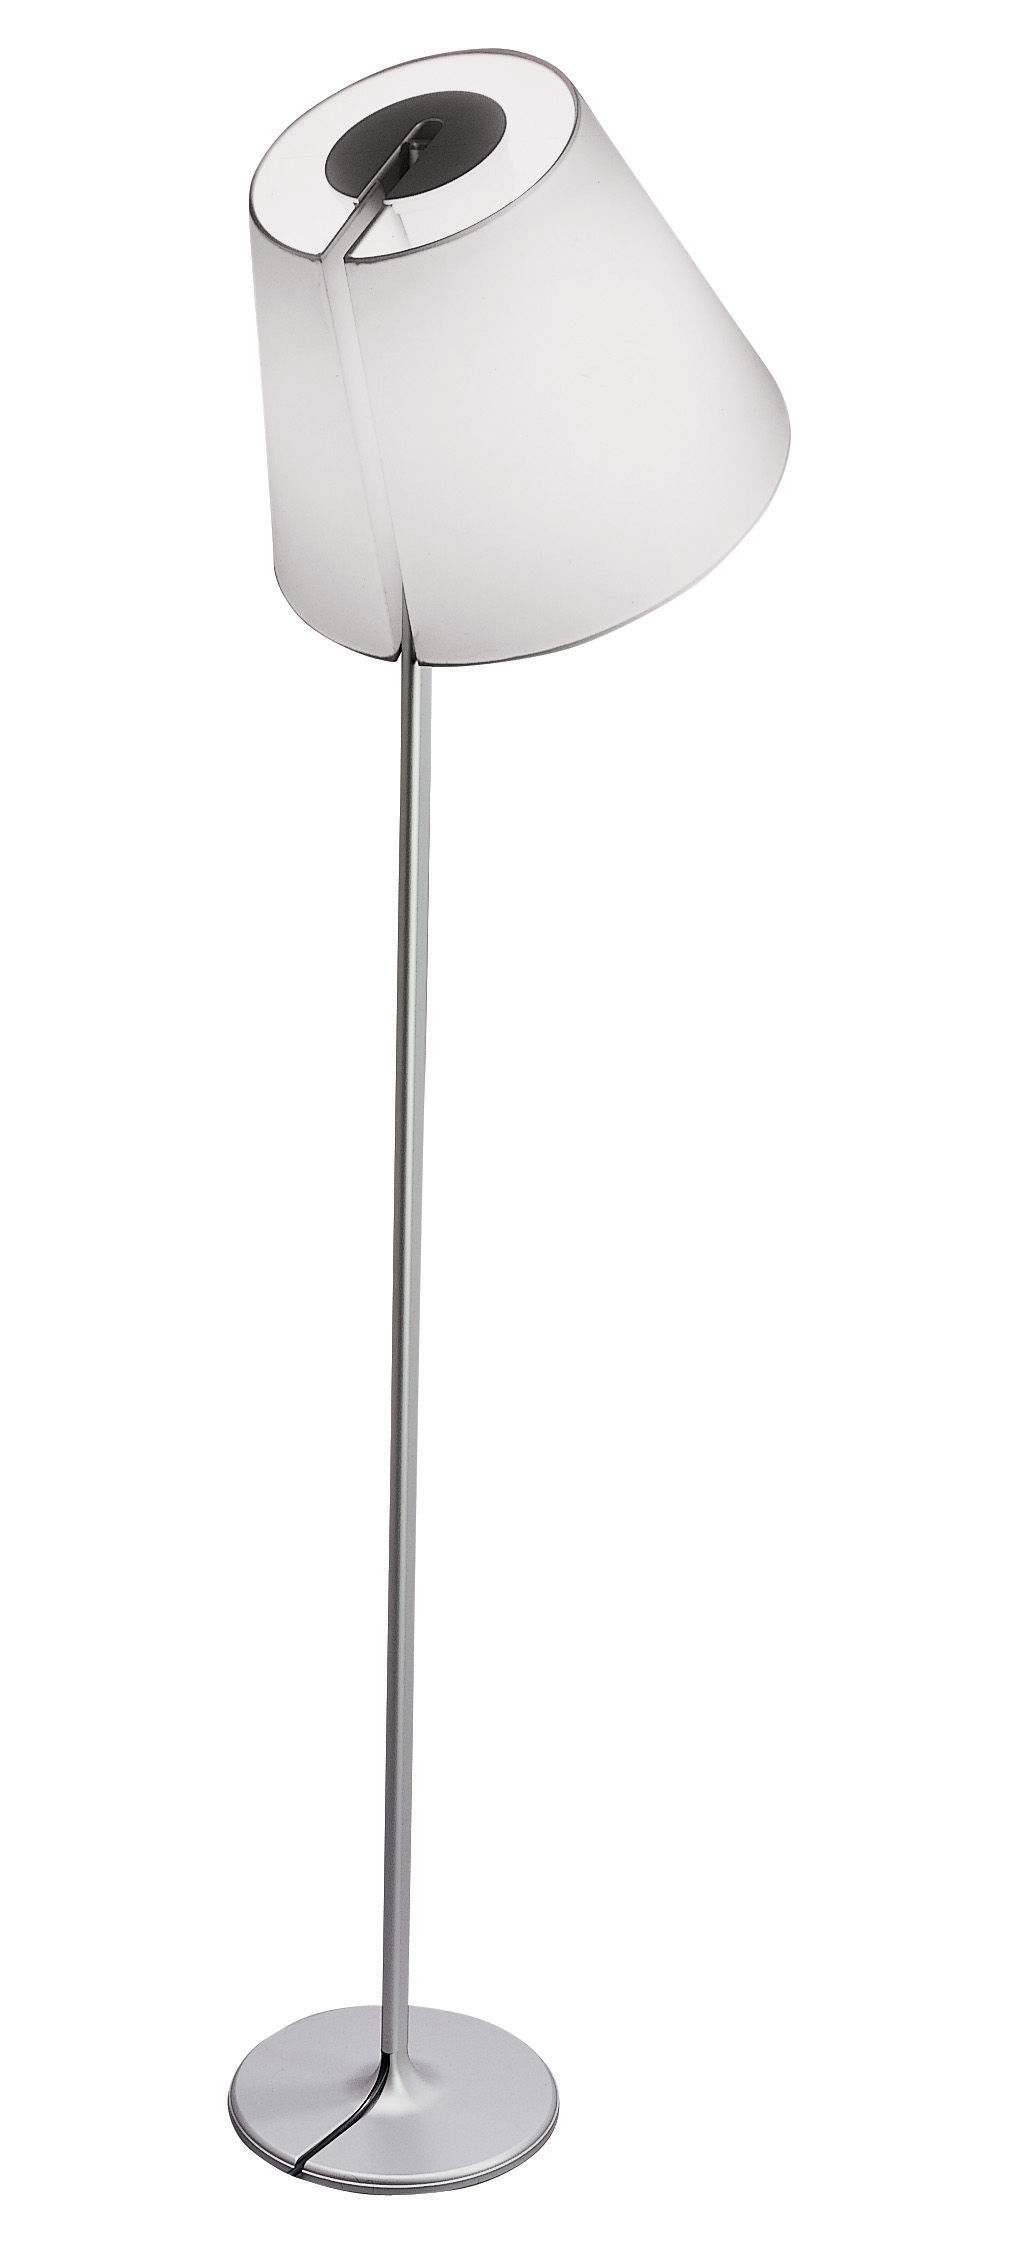 Leuchten - Stehleuchten - Melampo Mega Stehleuchte - Artemide - Aluminium-grau - Aluminium, Gewebe